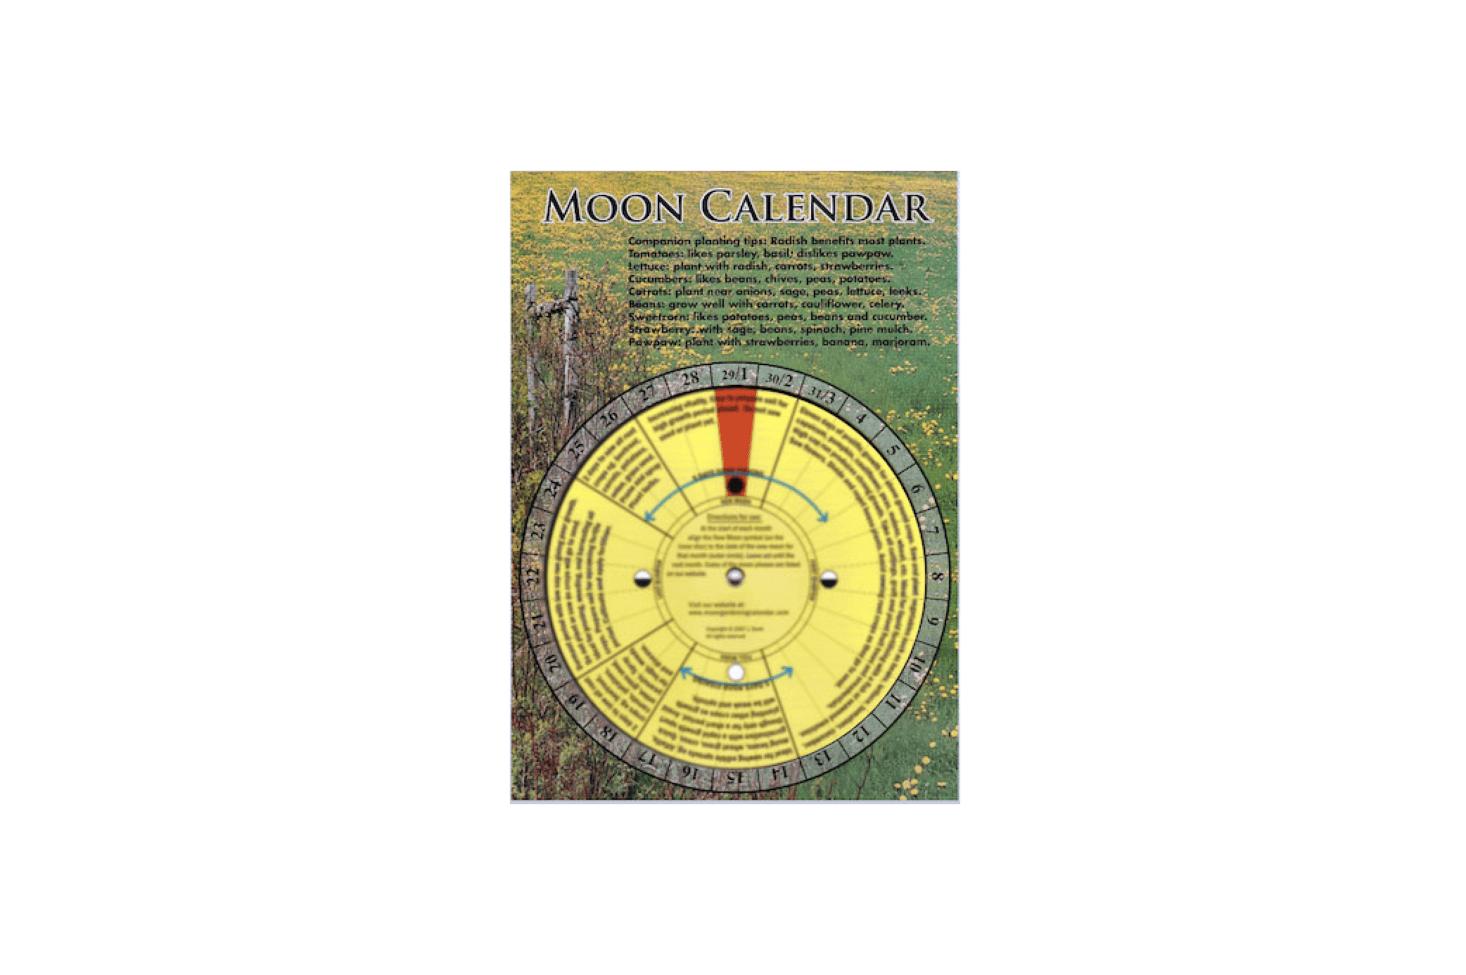 A laminated Moon Gardening Calendar has a central dial that &#8